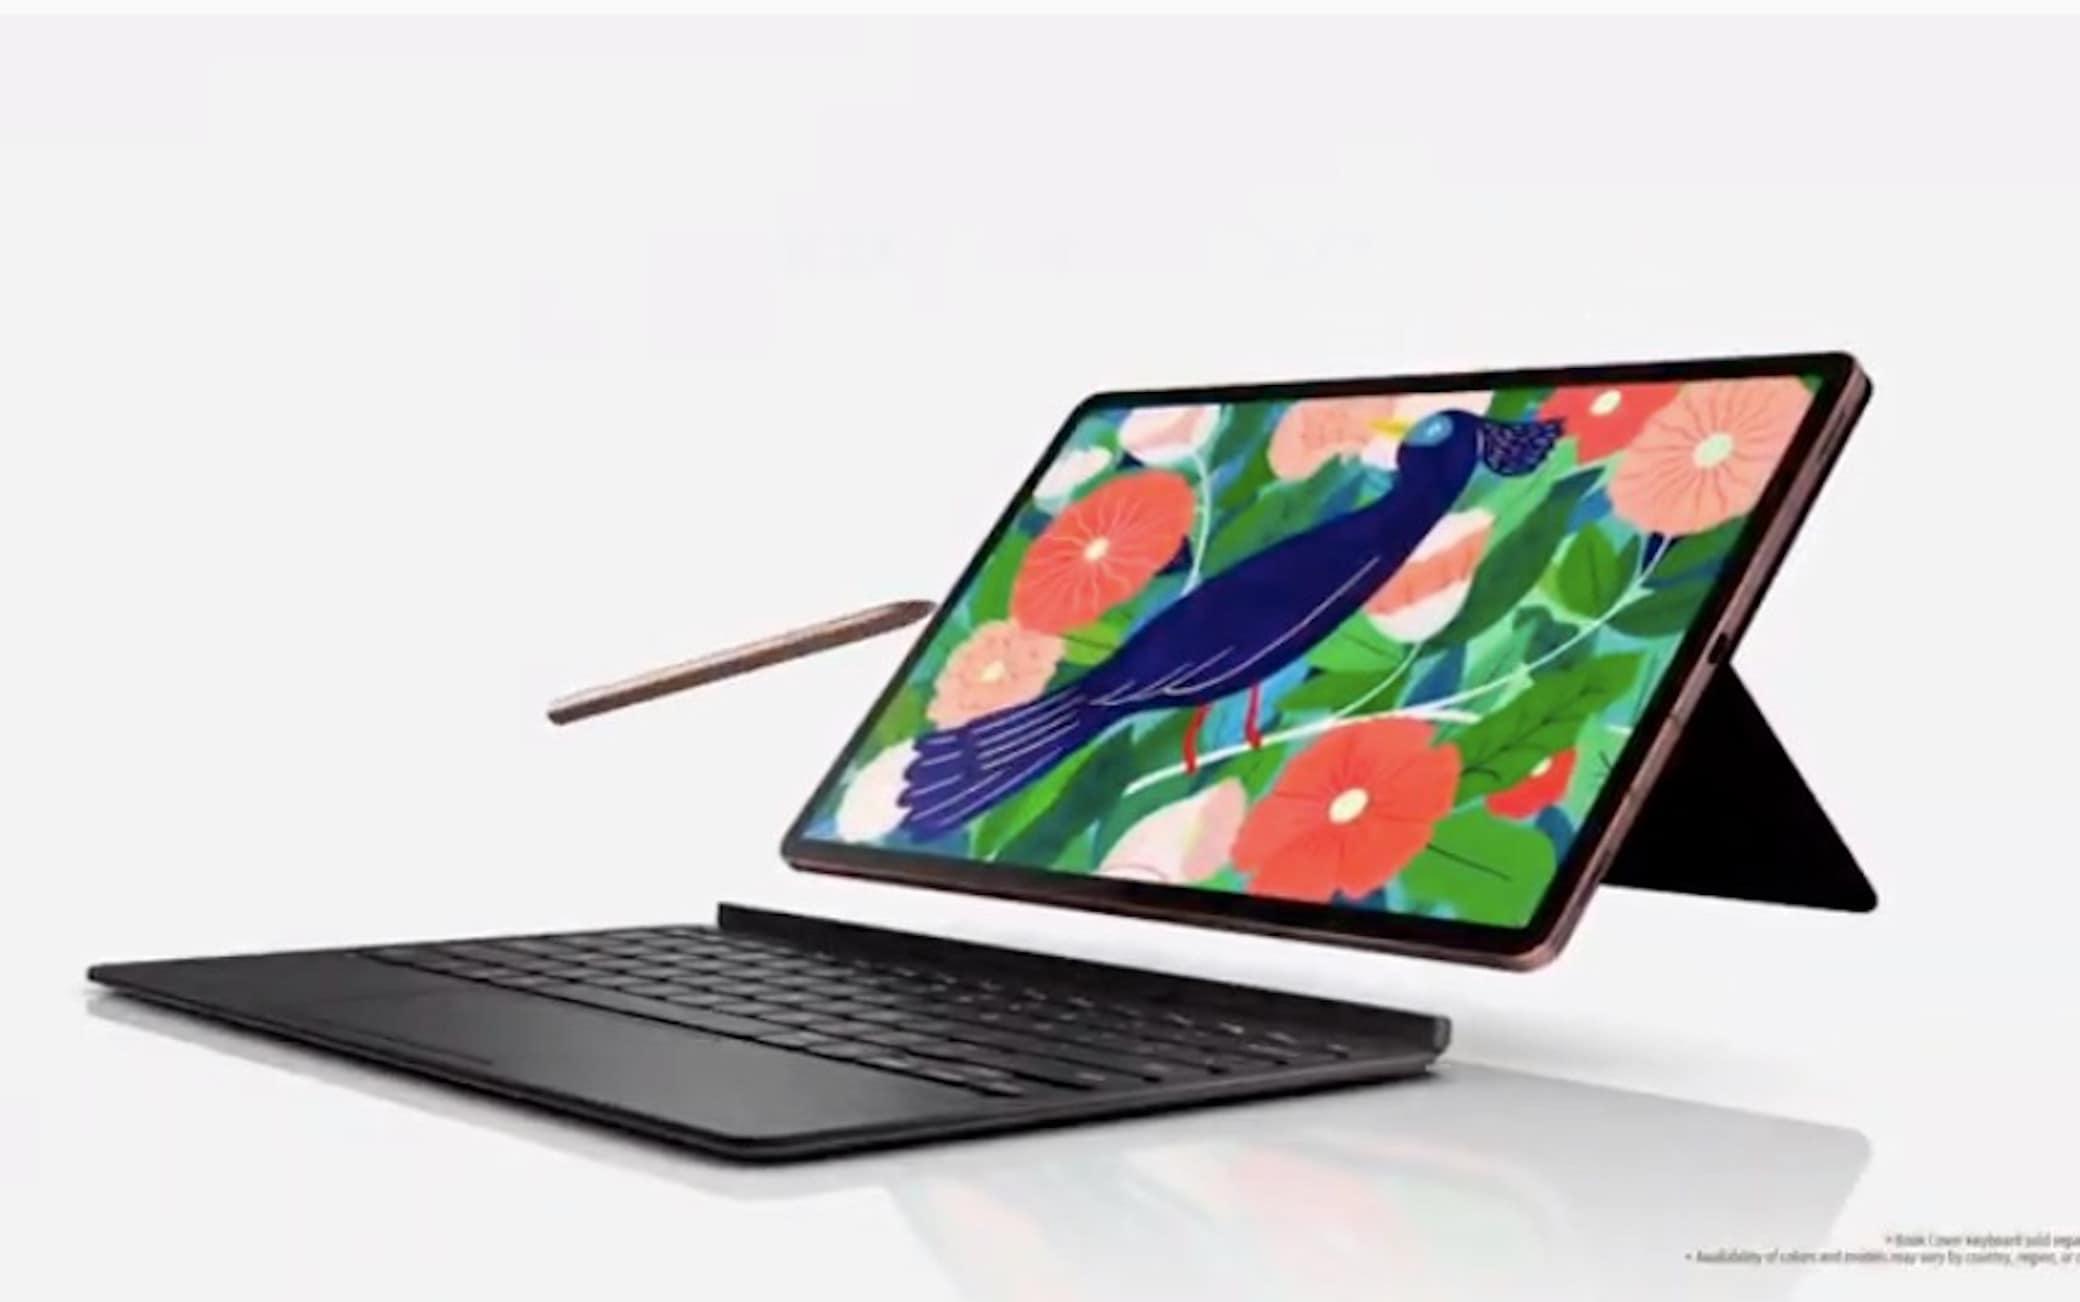 Il nuovo Galaxy Tab S7